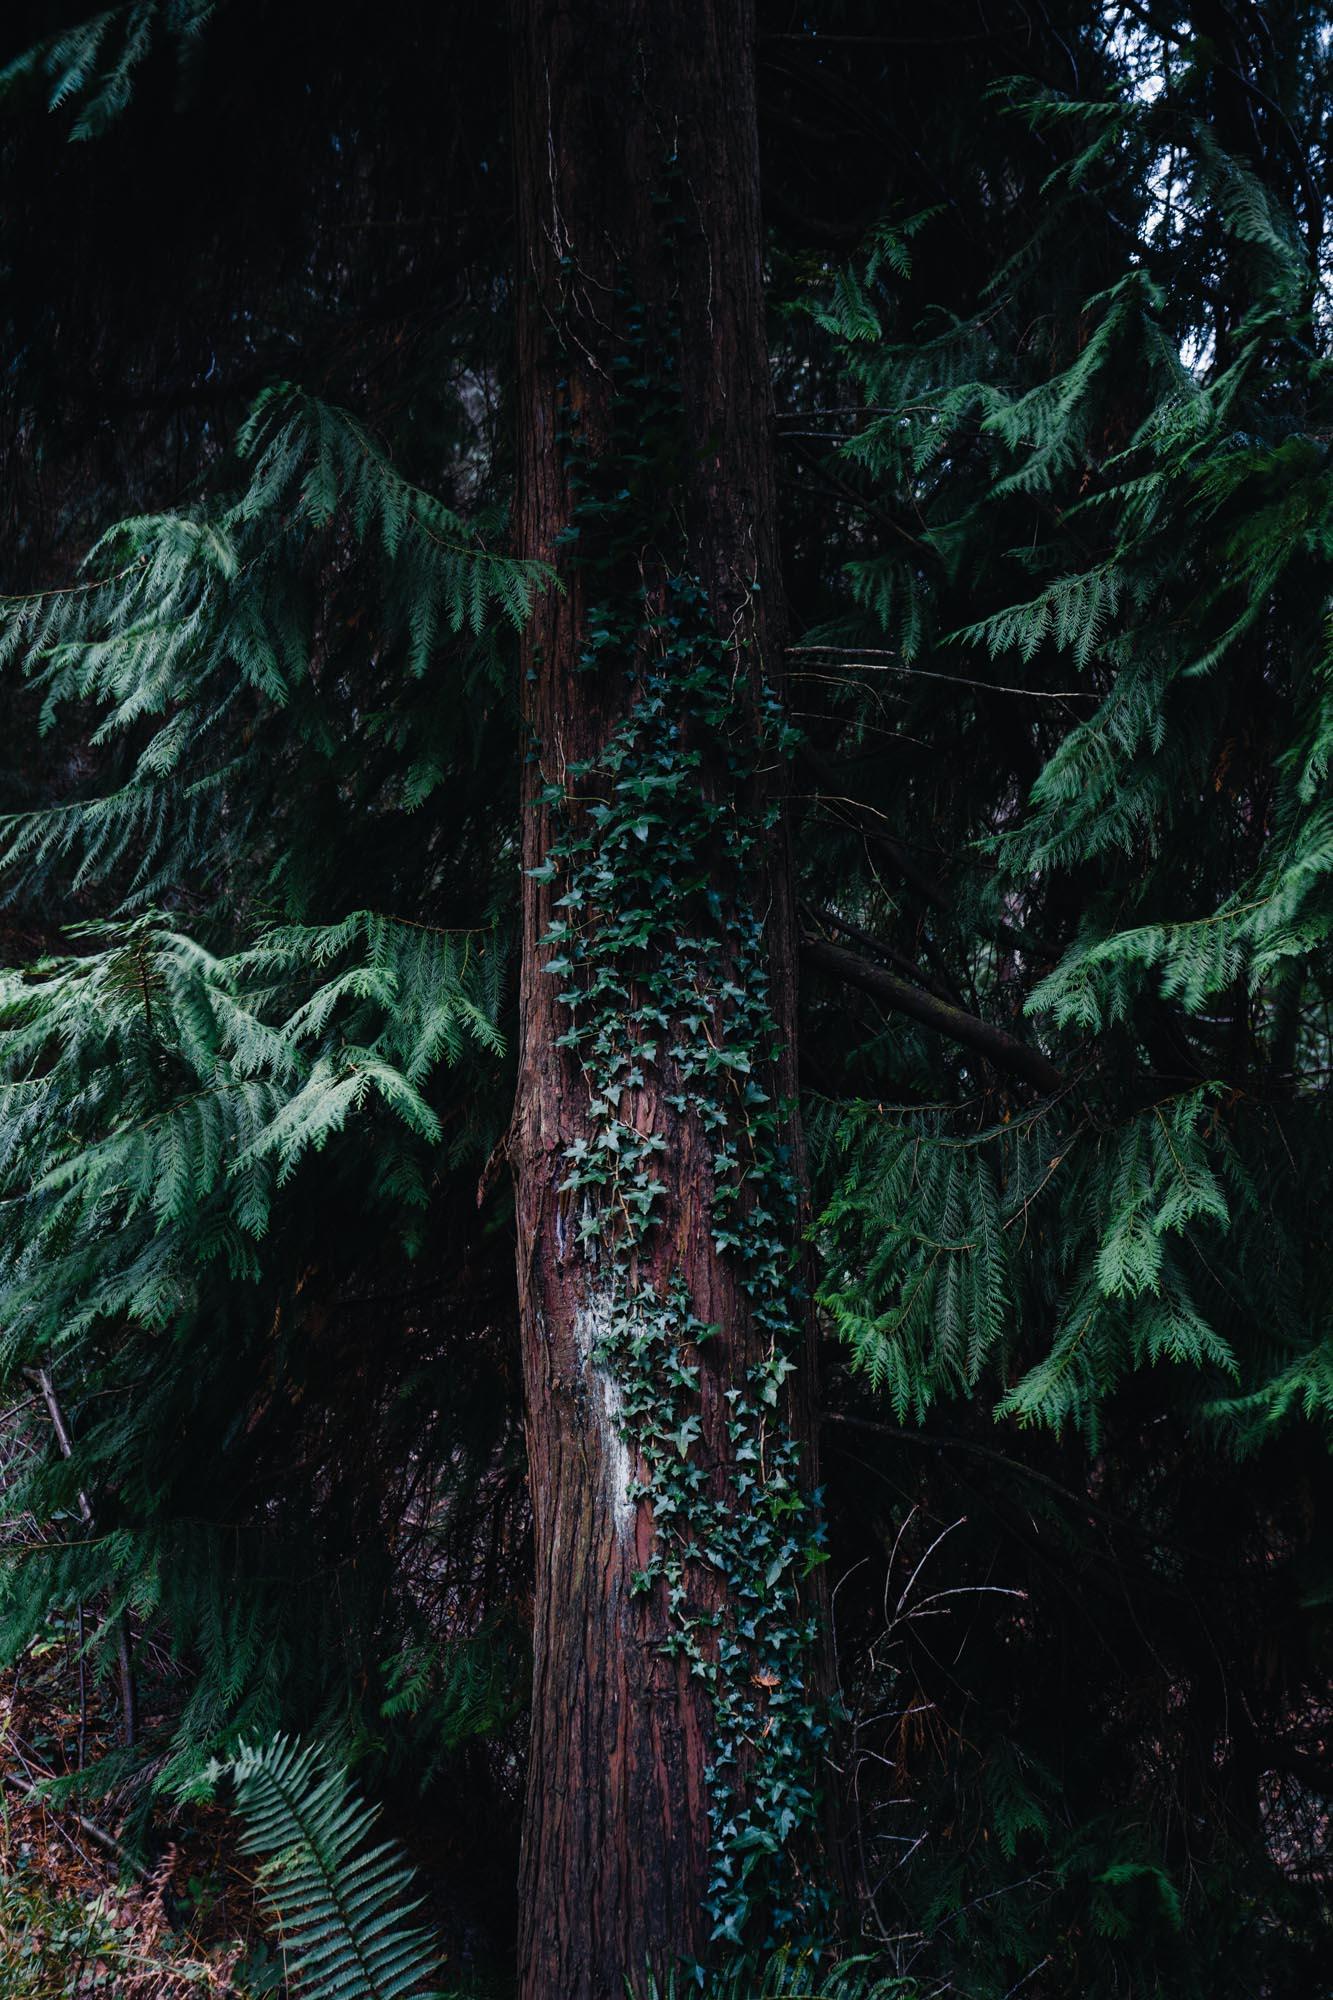 Arbol en bosque - Linzex